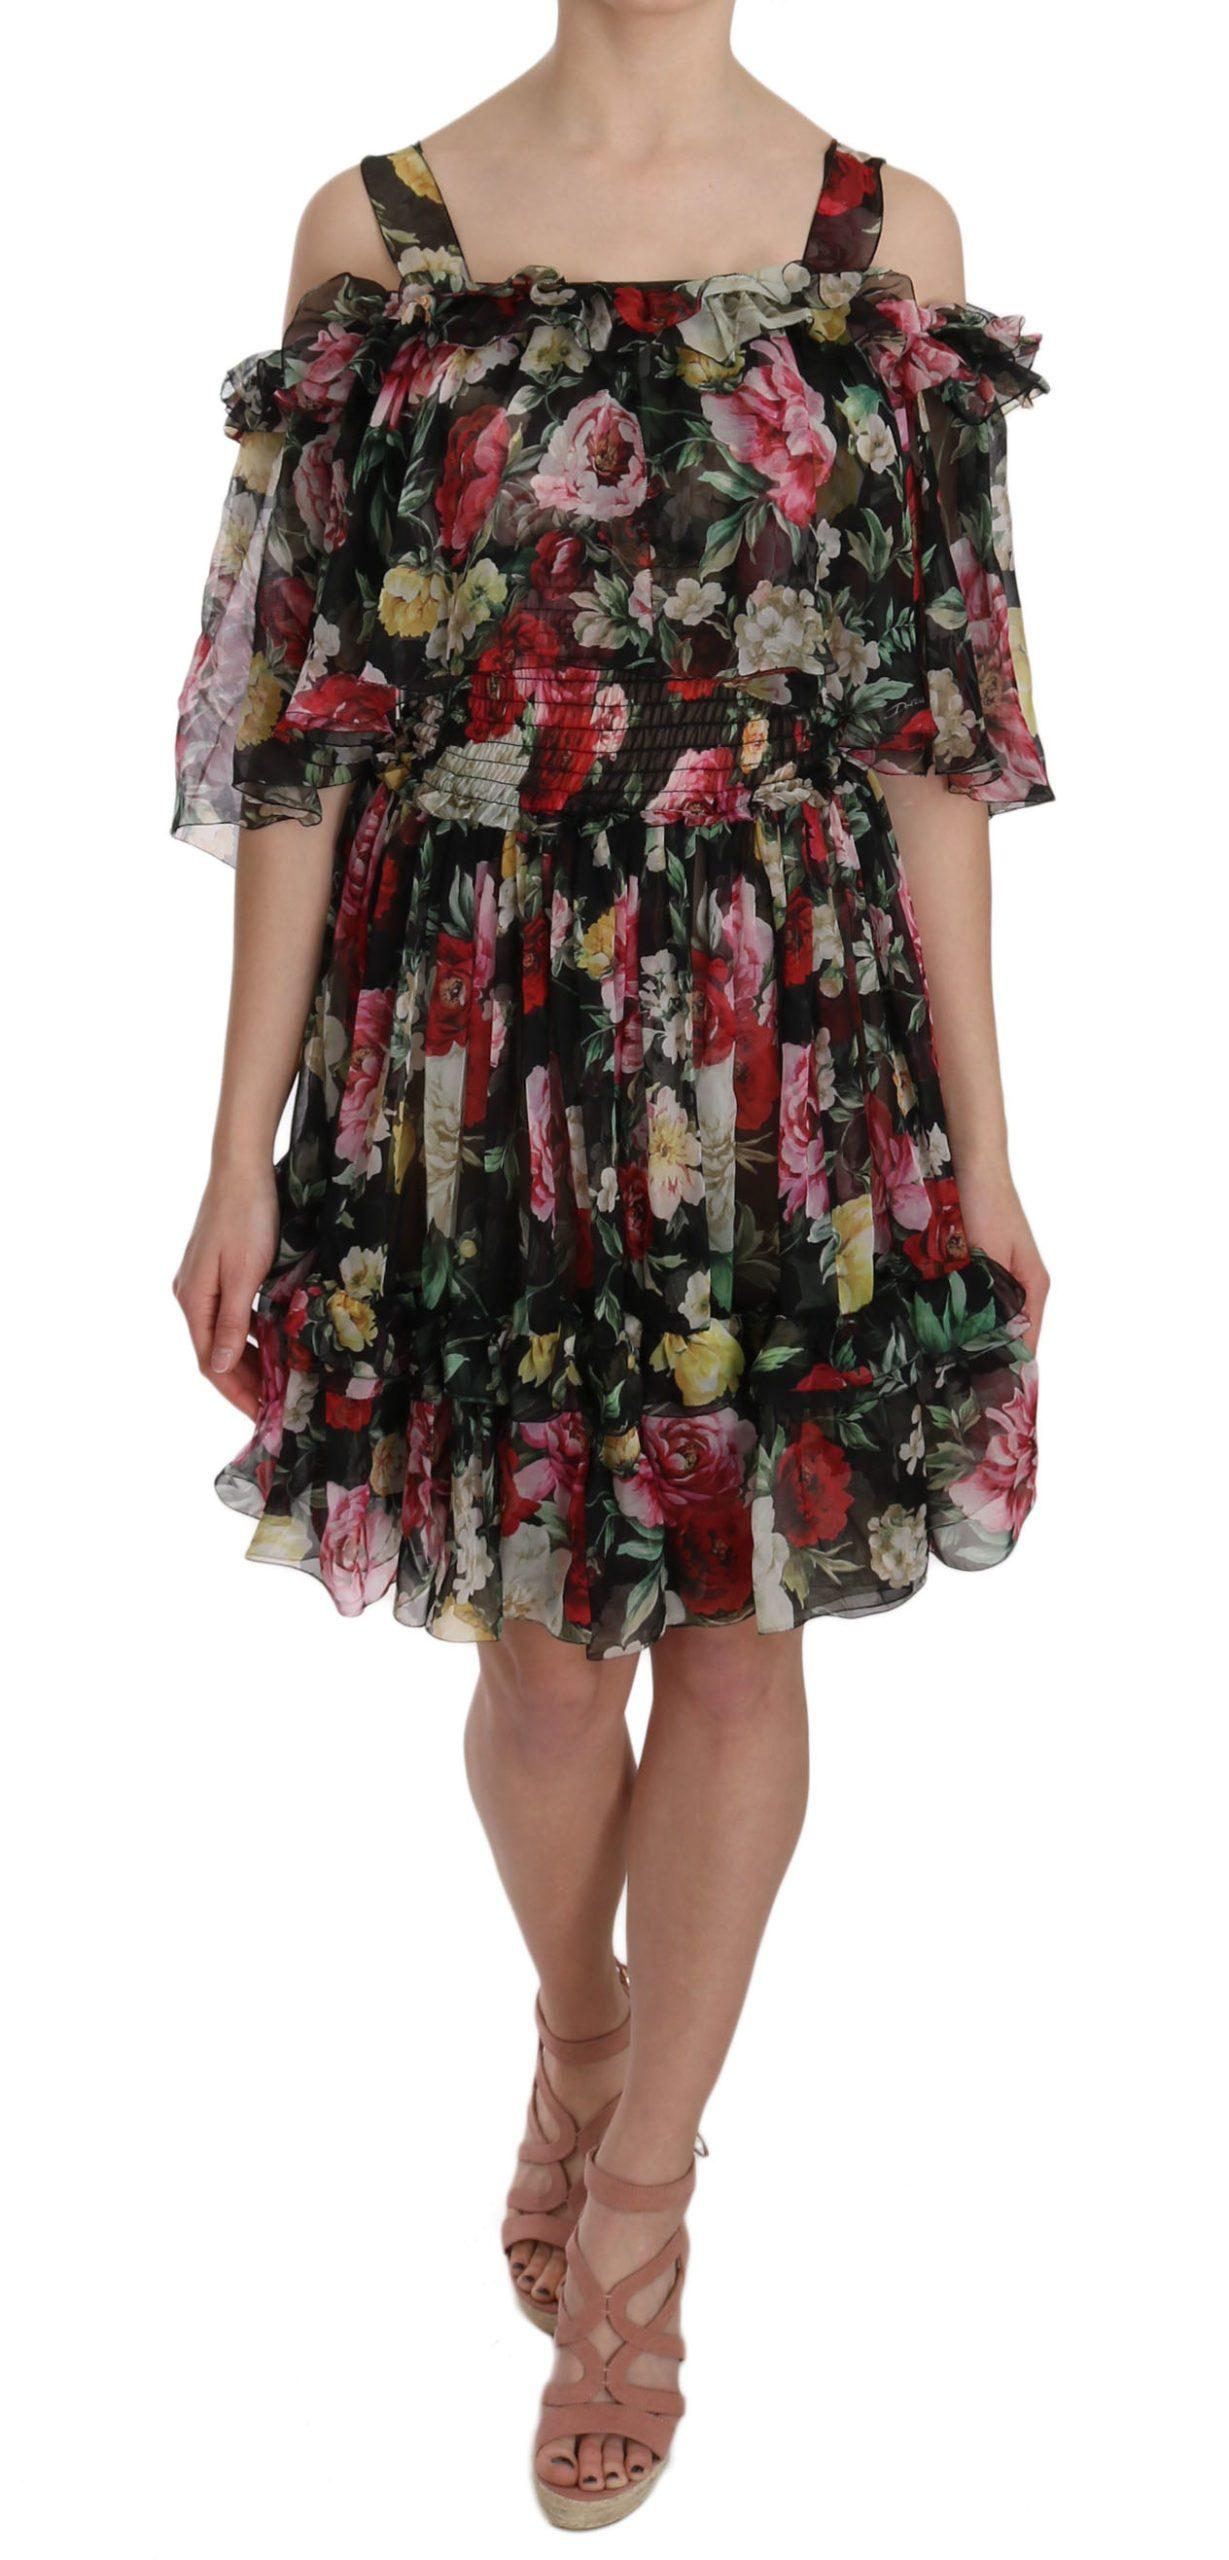 Dolce & Gabbana Women's Chiffon Floral Mini Dress Multicolor DR1622 - IT38 XS